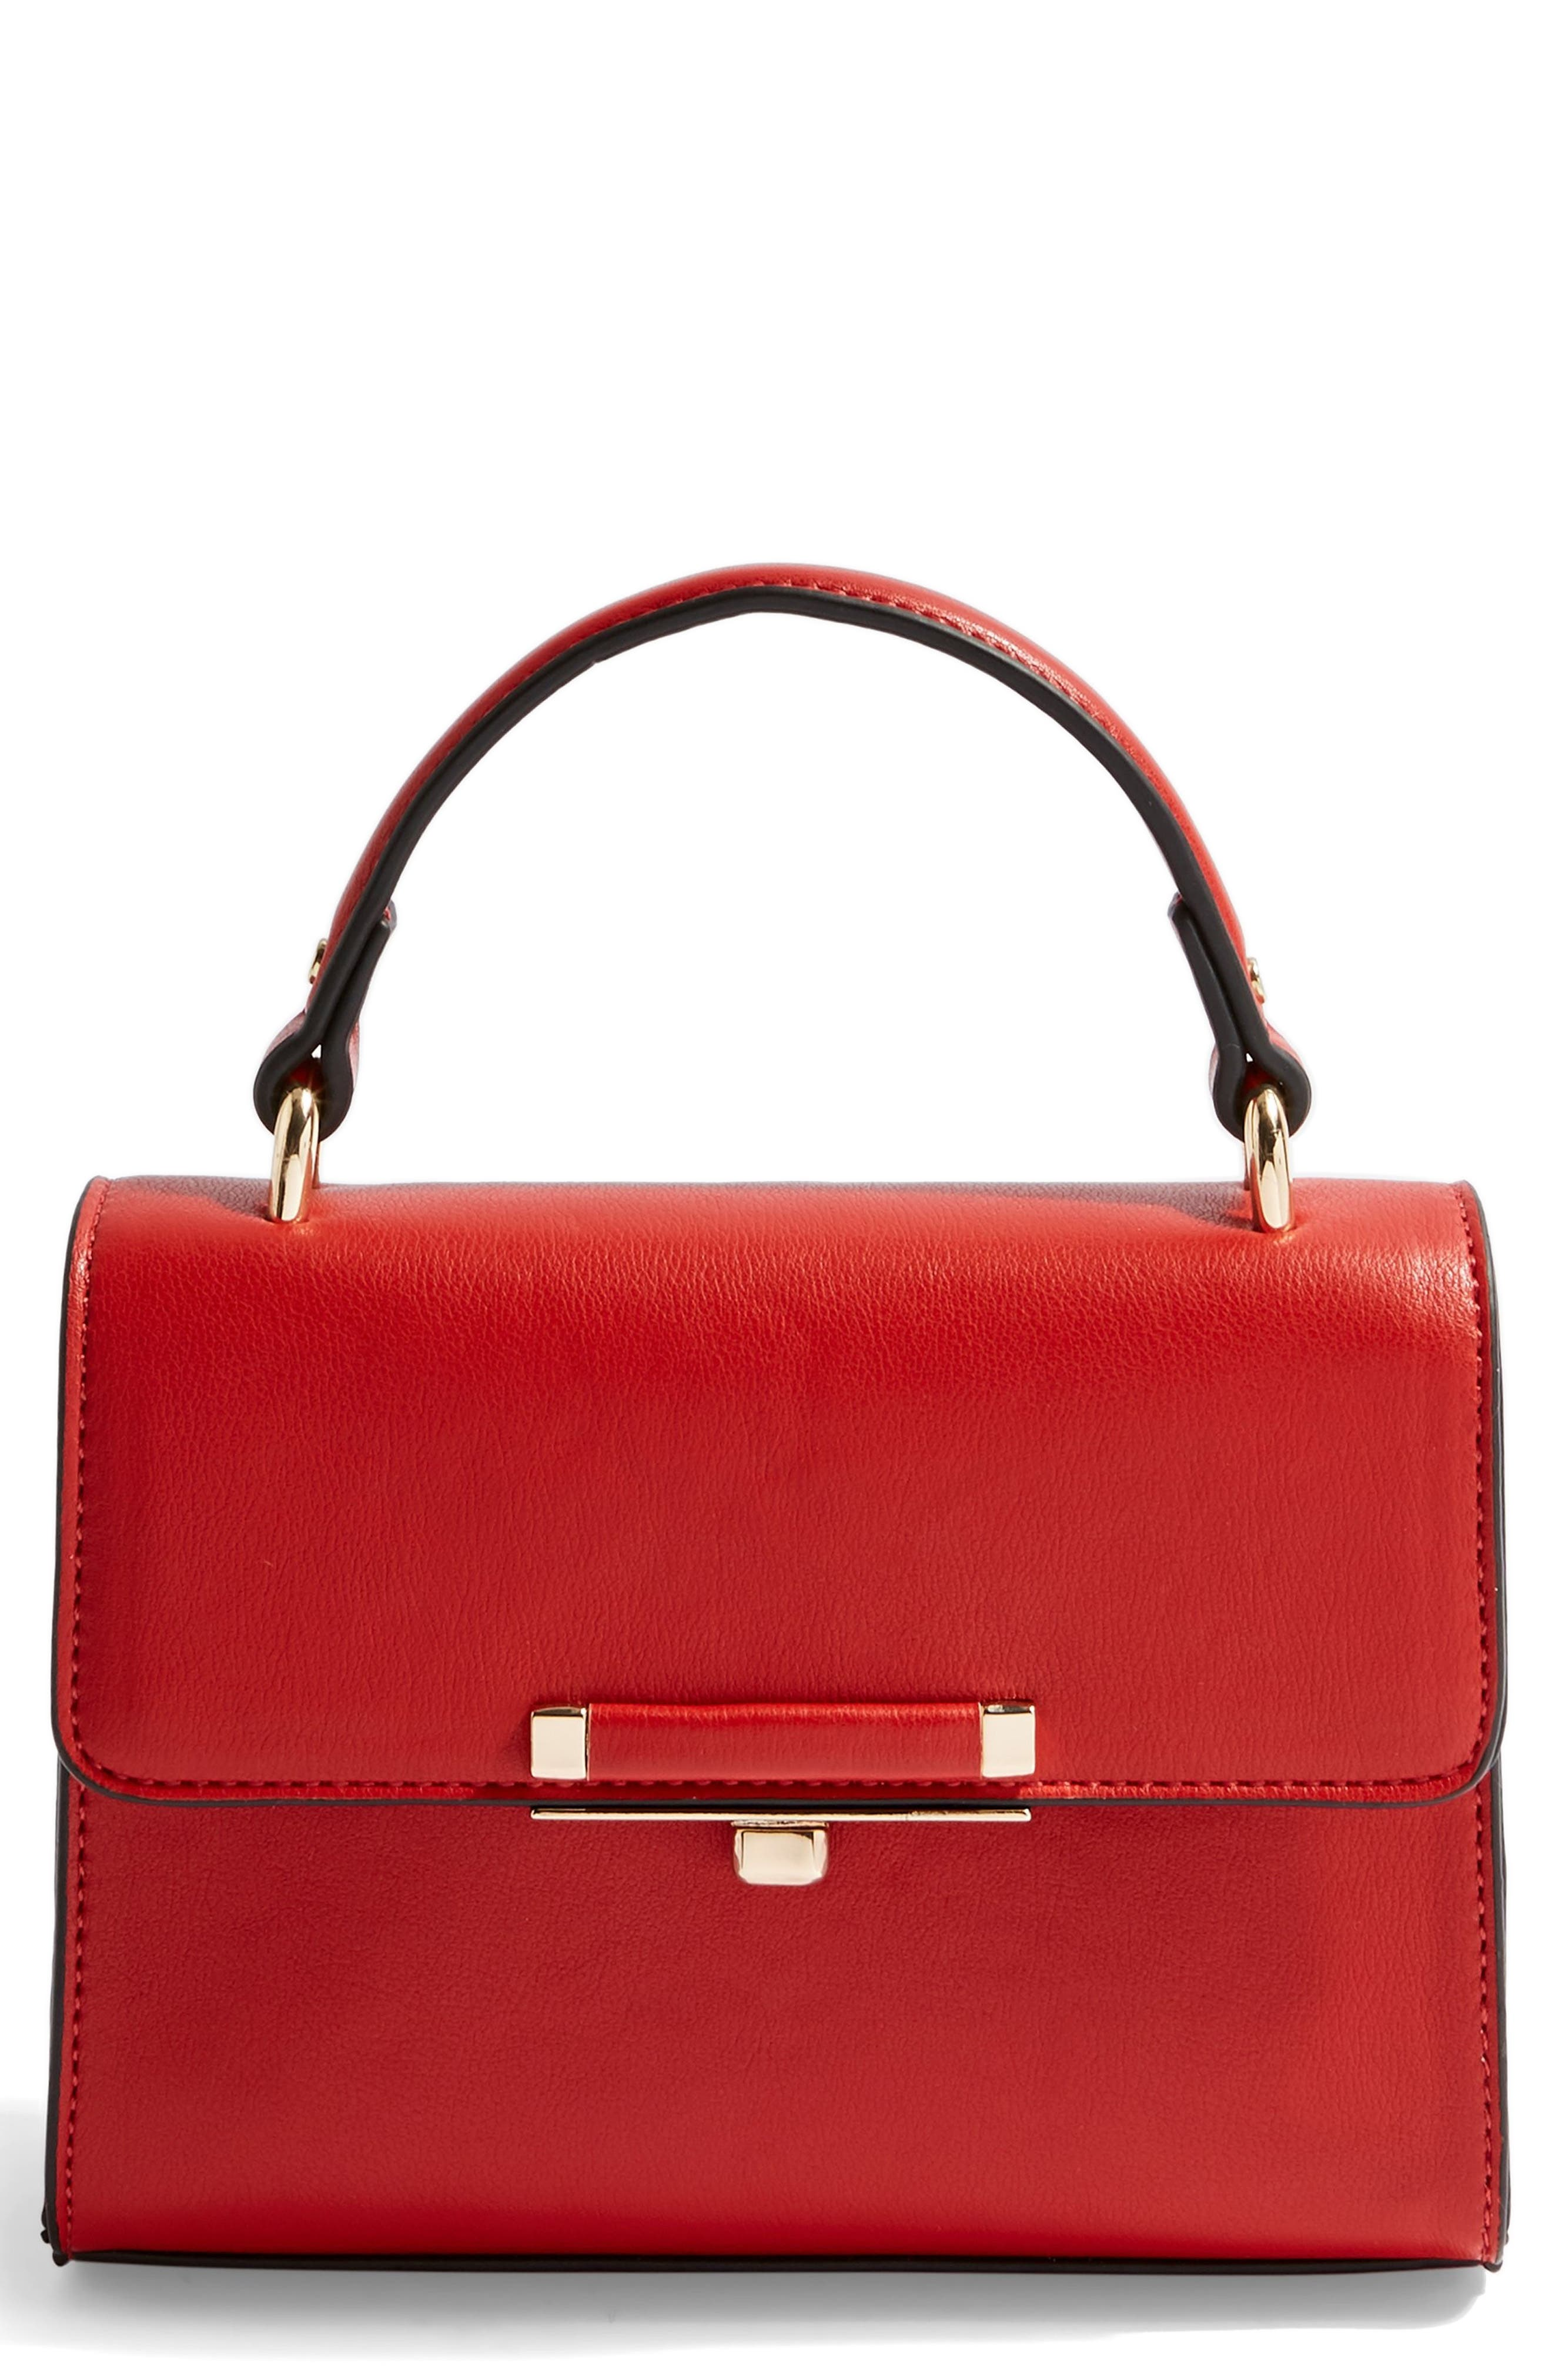 TOPSHOP,                             Mini Marissa Top Handle Bag,                             Main thumbnail 1, color,                             RED